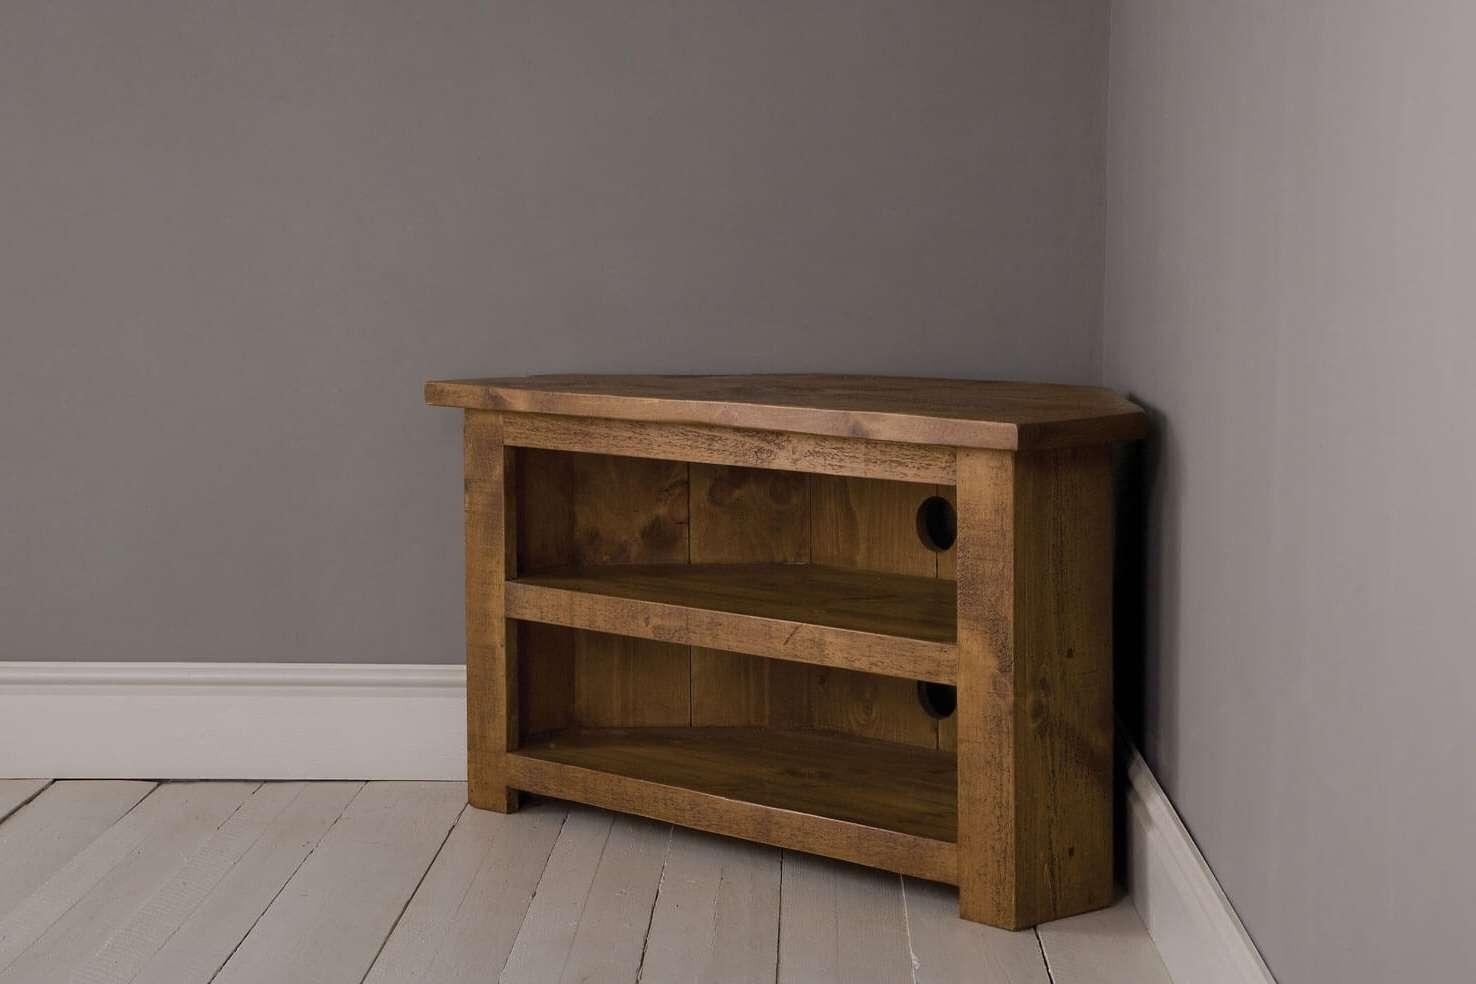 Plank Corner Tv Unit With Shelfindigo Furniture Regarding Wood Corner Tv Cabinets (Gallery 10 of 20)